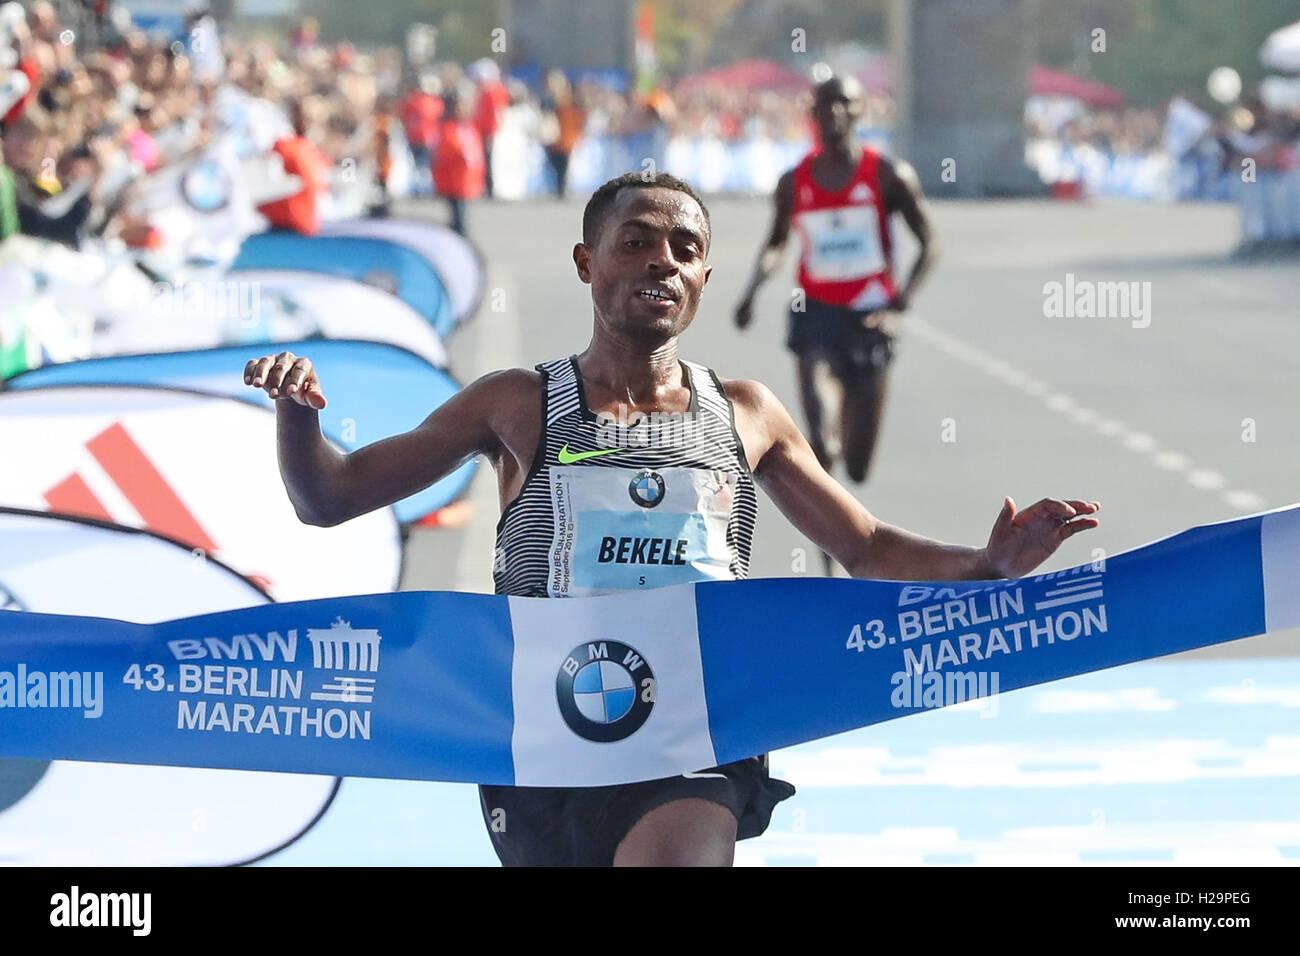 Berlino, Germania. Xxv Sep, 2016. Kenenisa Bekele (ETH) ha vinto la xliii la maratona di Berlino, tenutasi a Berlino. Immagini Stock